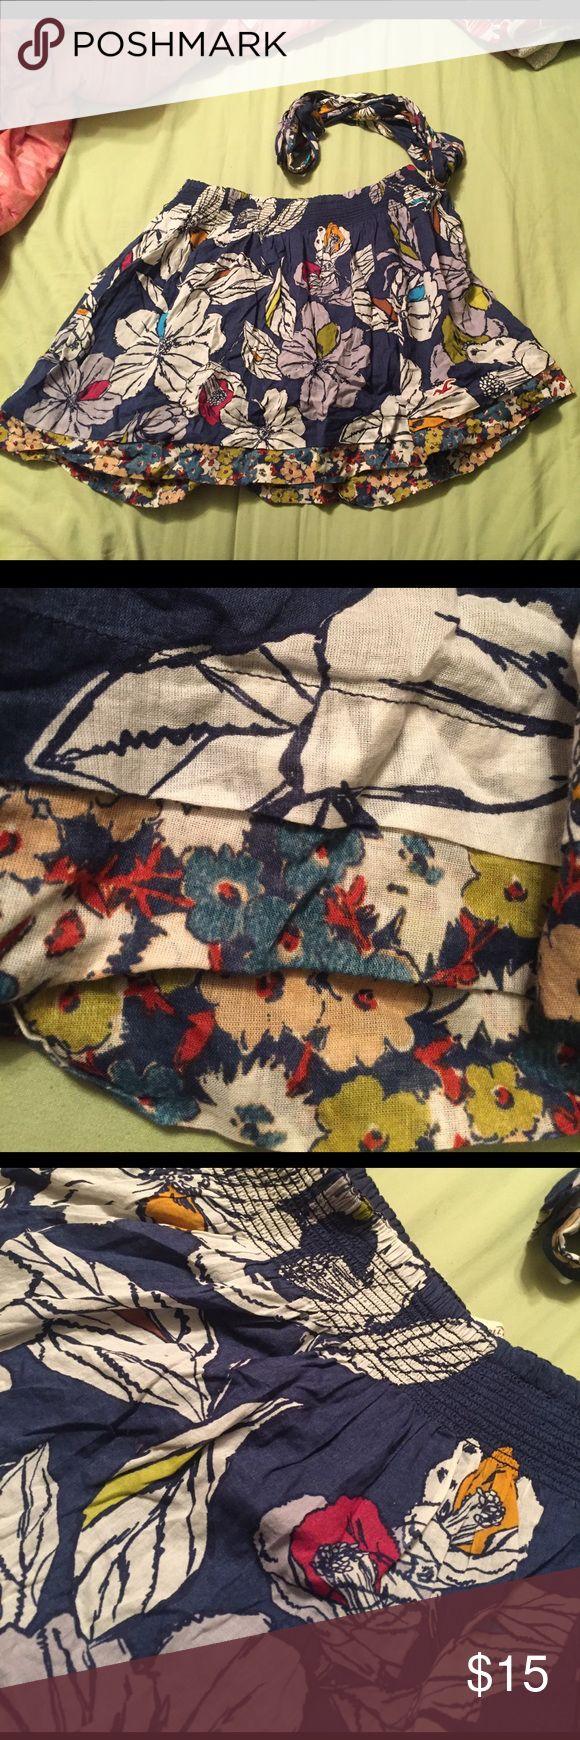 Large Hollister Skirt floral print Large Hollister Skirt with a floral print. Comes with matching fabric belt and elastic waist band. 100% Cotton. Hollister Skirts Mini